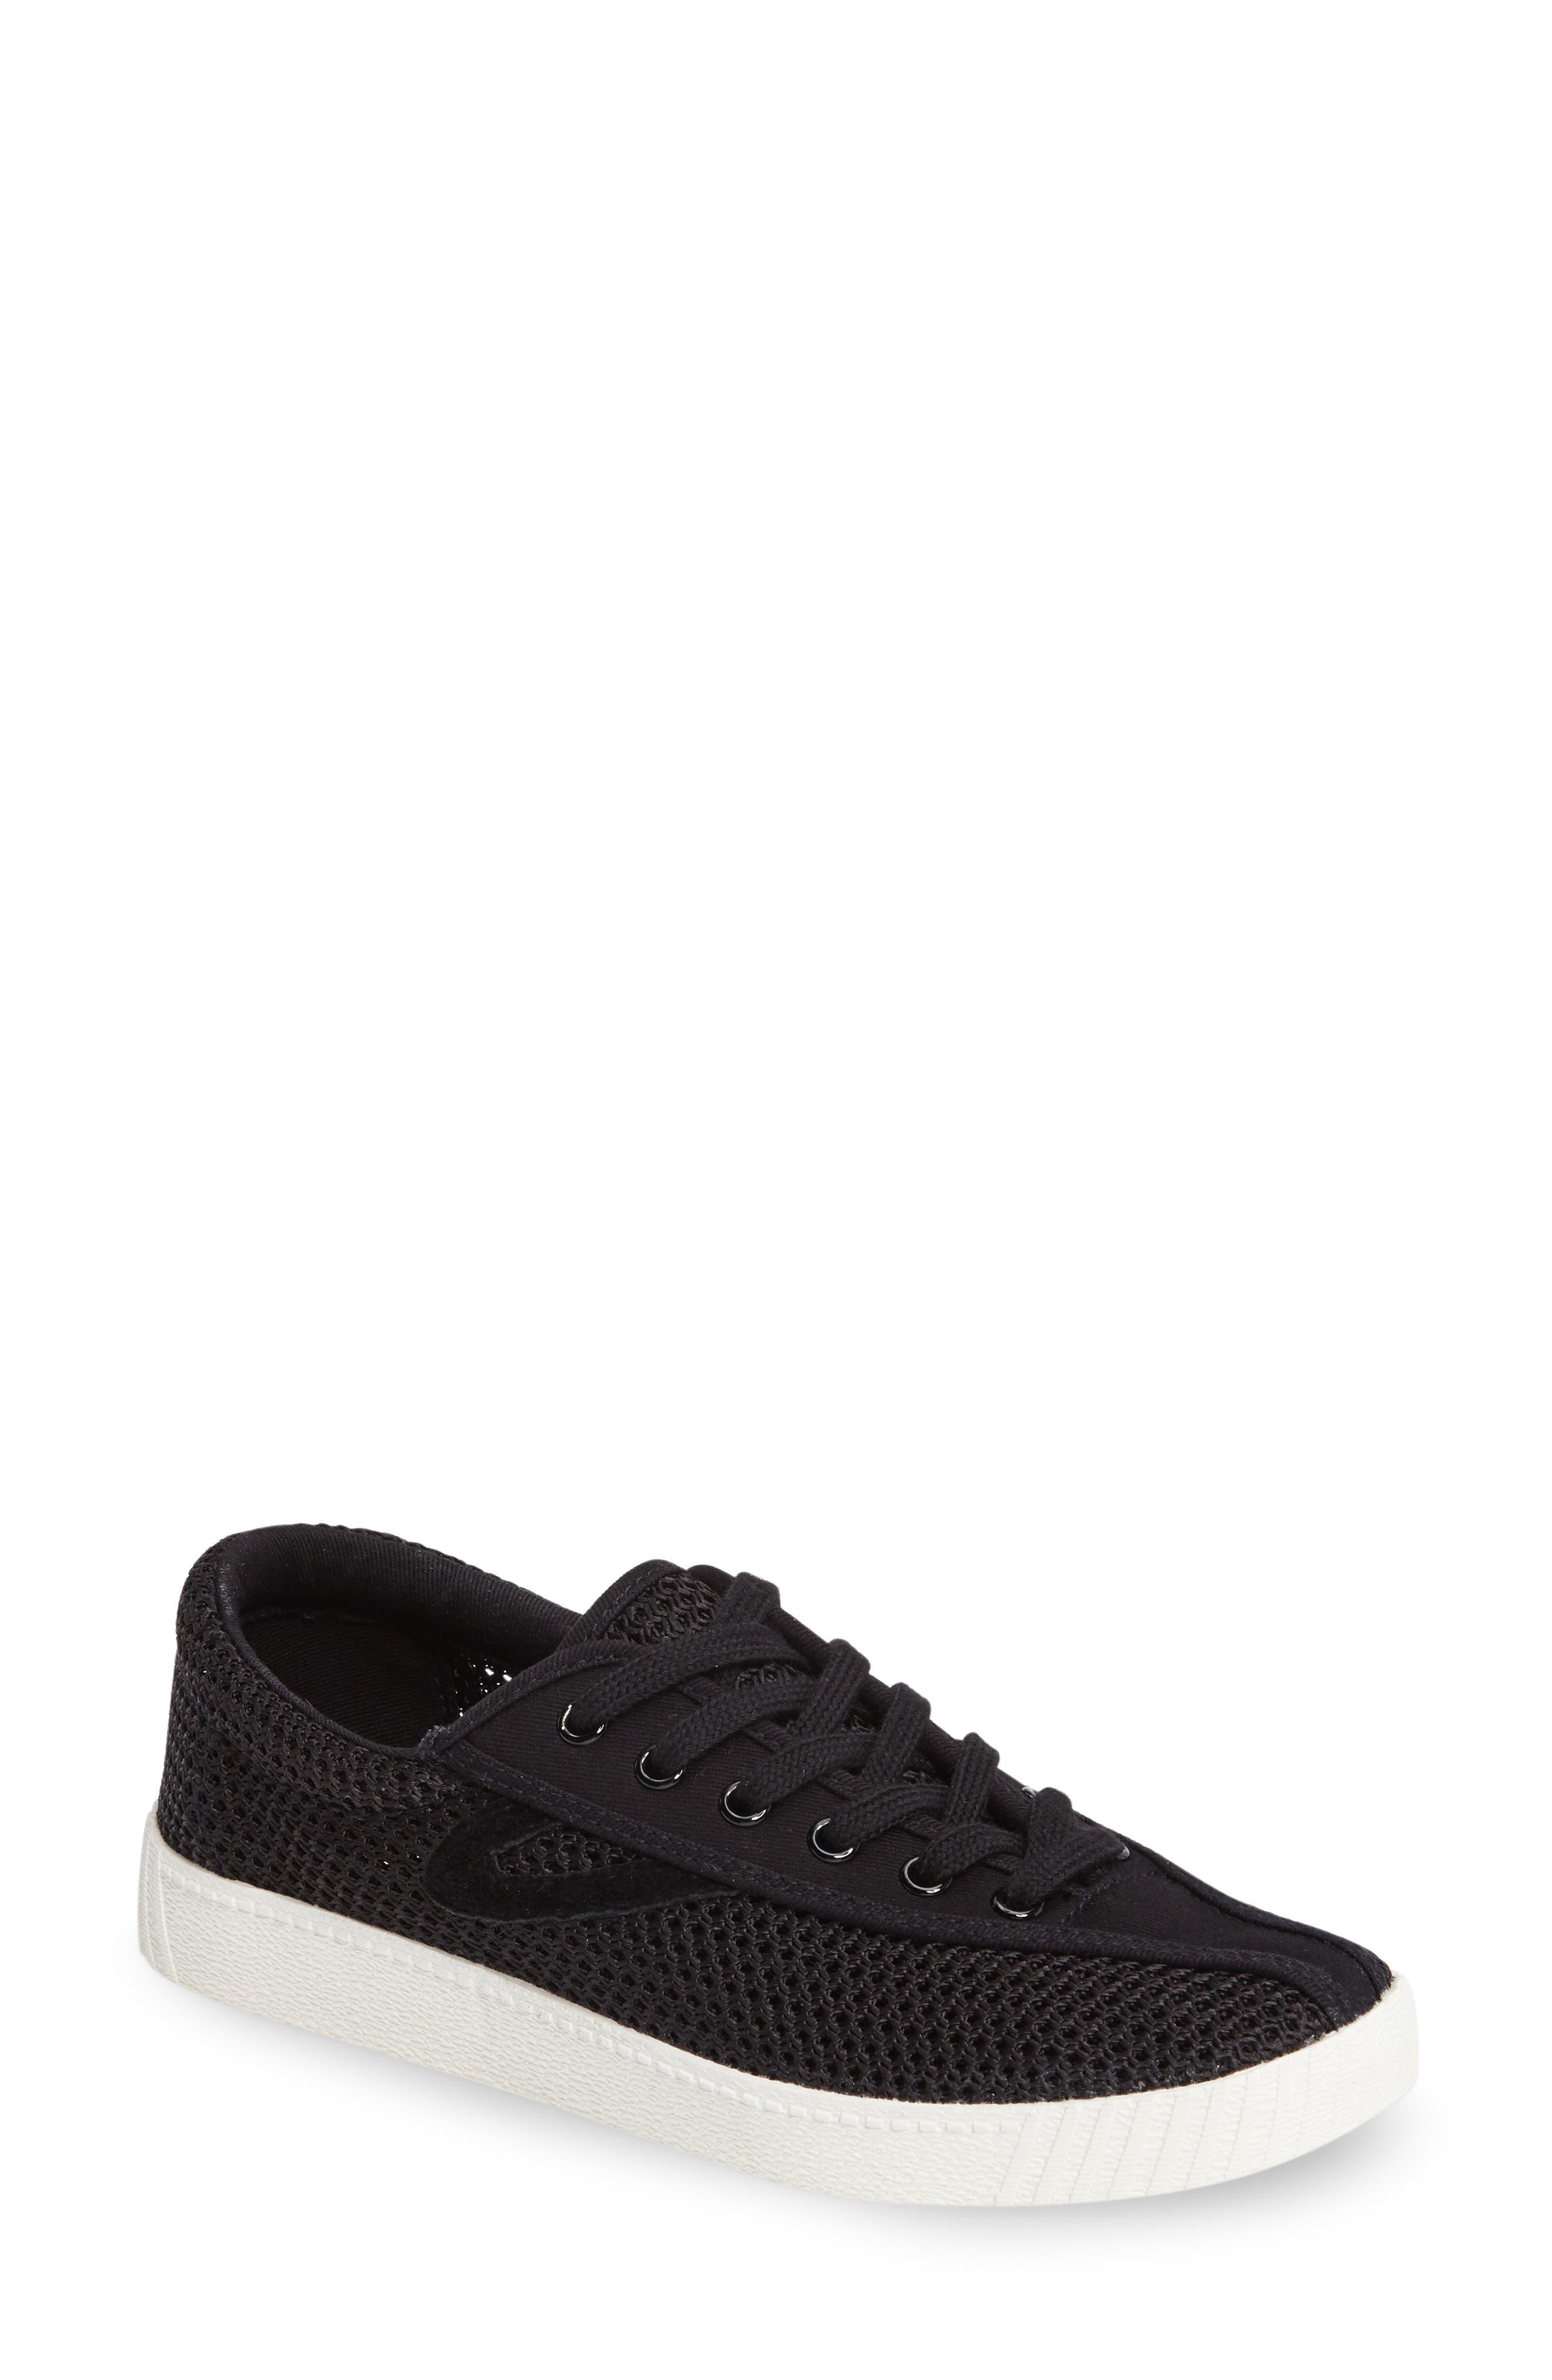 Nylite Sneaker,                         Main,                         color, 001